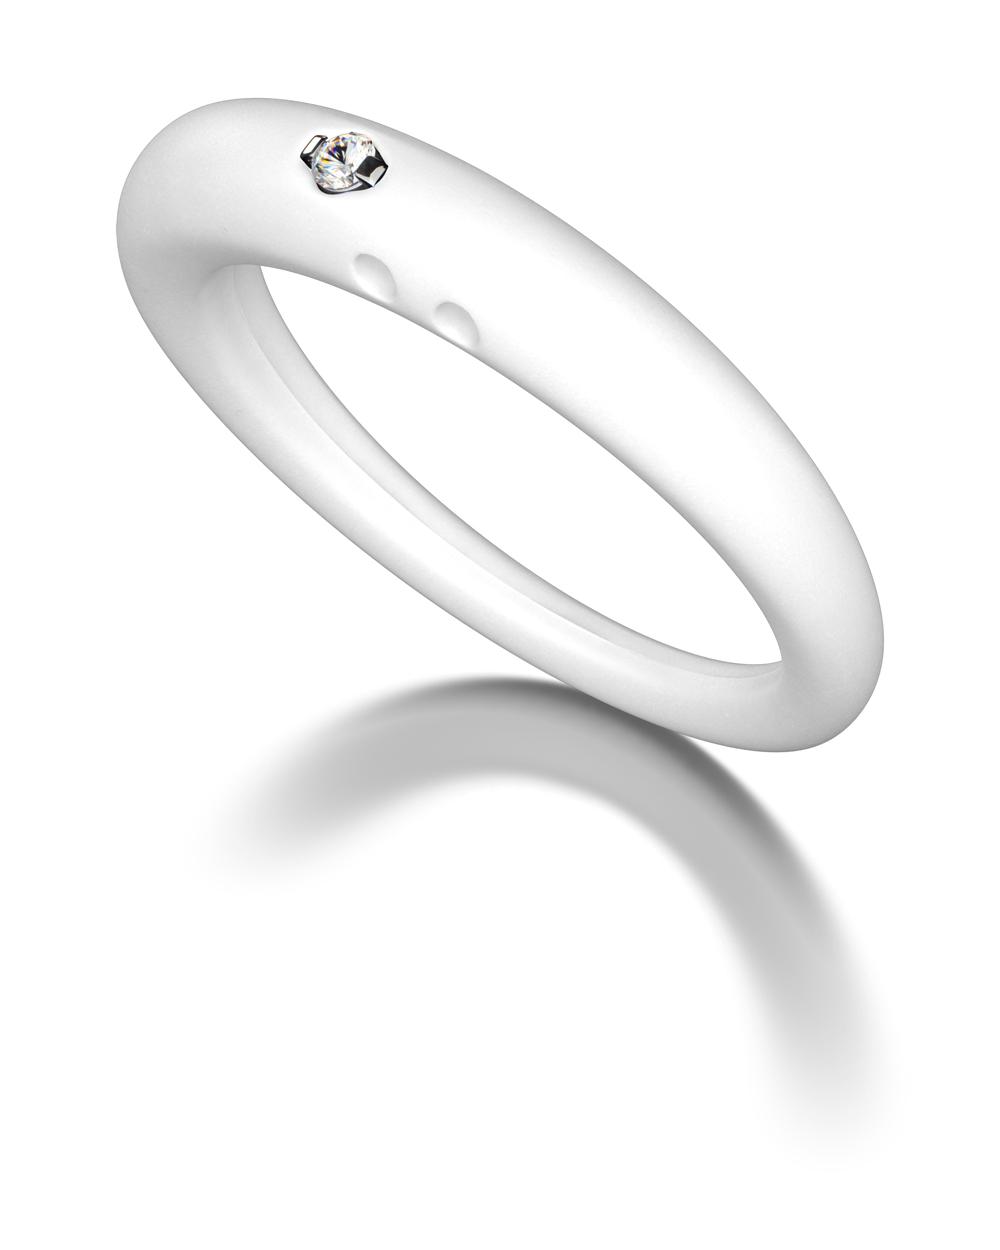 DUEPUNTI_ San Valentino 2015_anello bianco